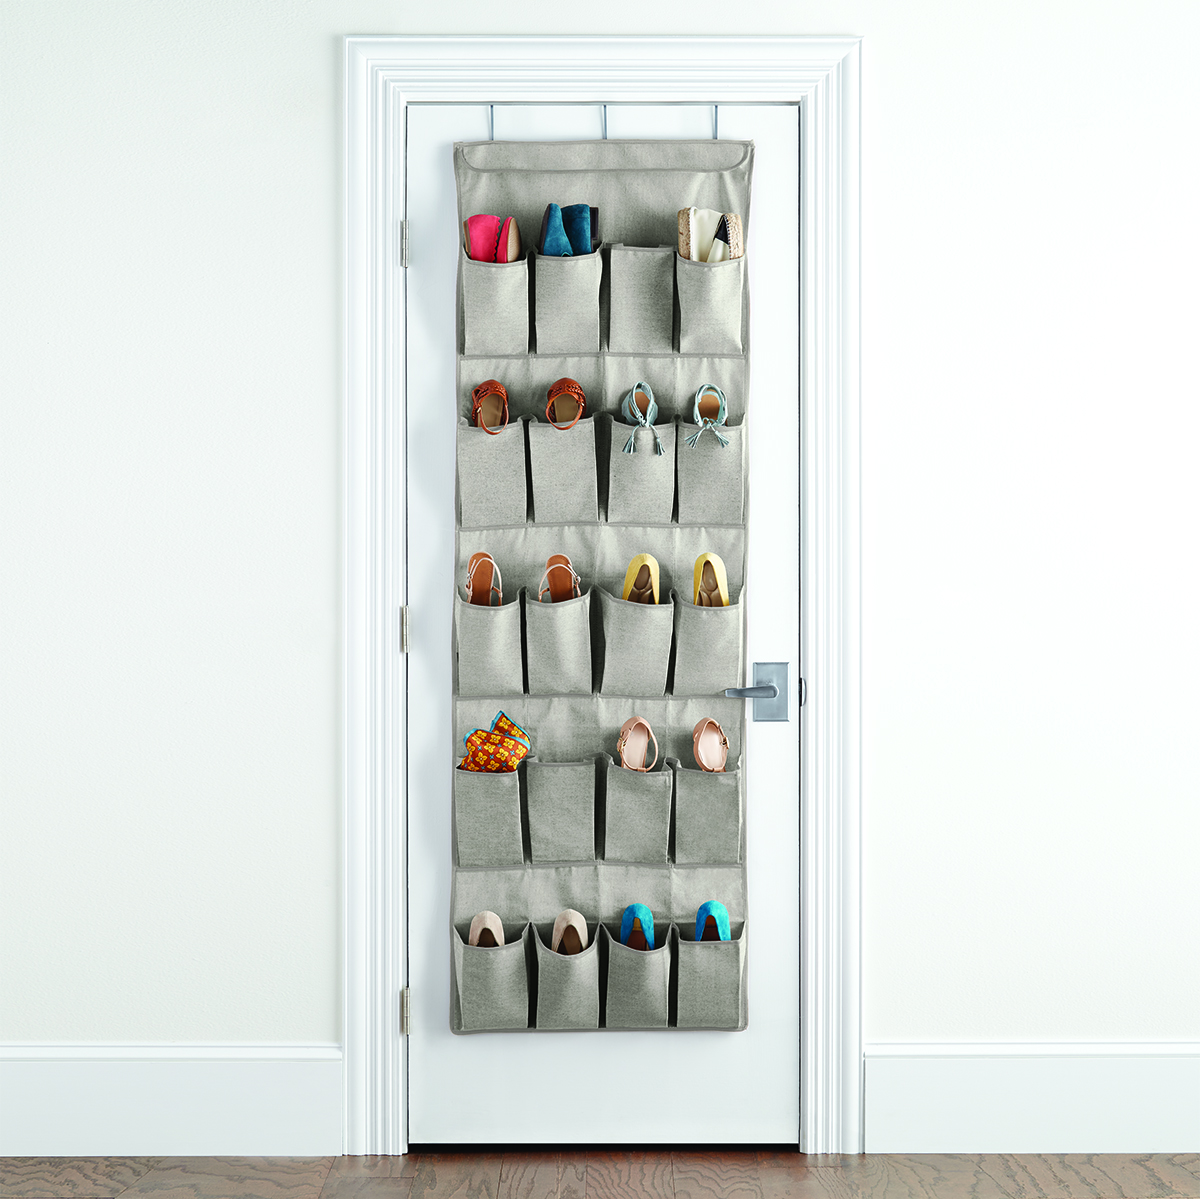 Over The Door Shoe Organizer Rack Hanging Storage Holder Hanger Bag Closet Hooks